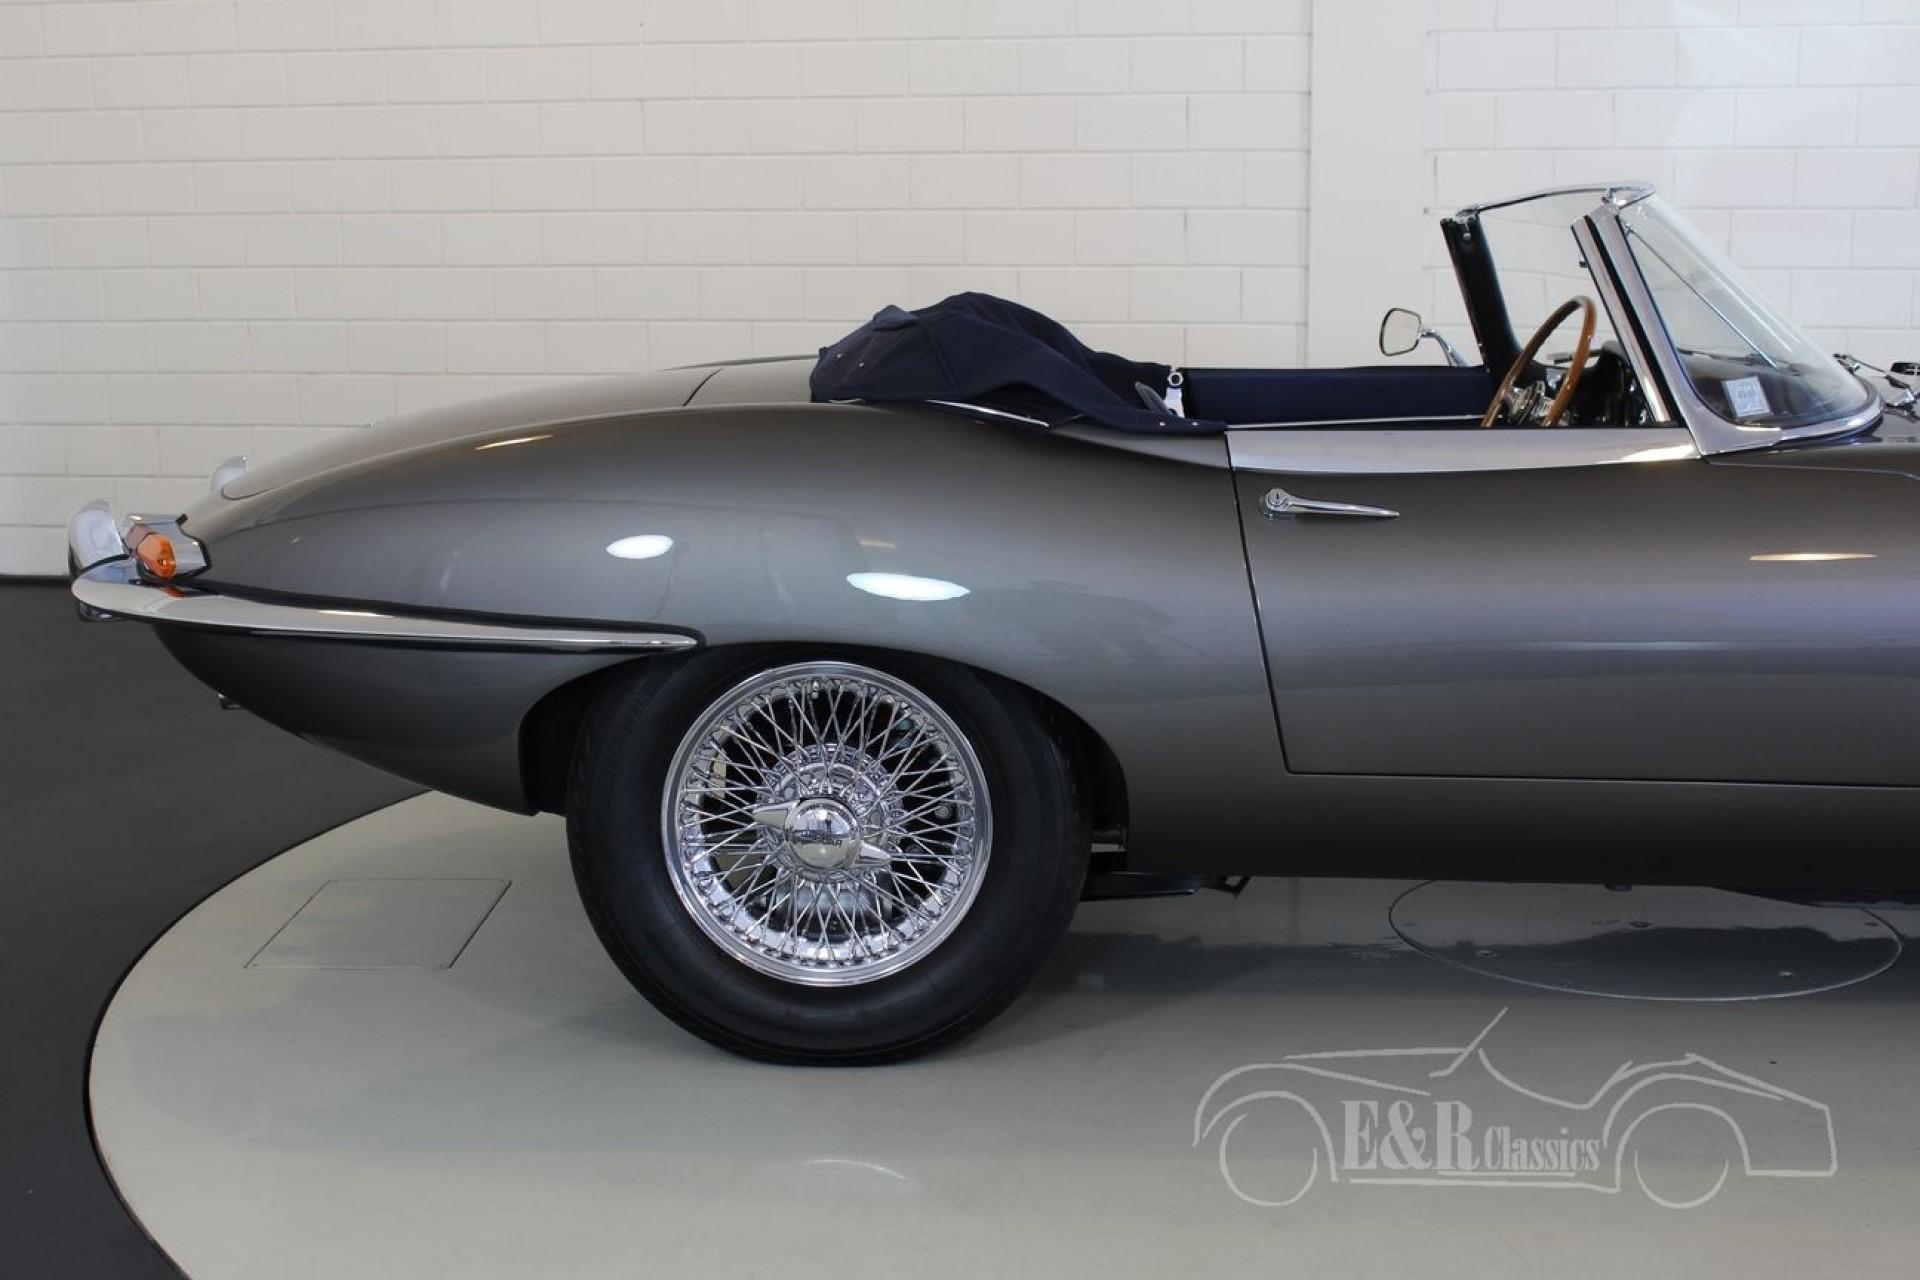 jaguar e type s1 3 8l cabriolet 1963 zum kauf bei erclassics. Black Bedroom Furniture Sets. Home Design Ideas